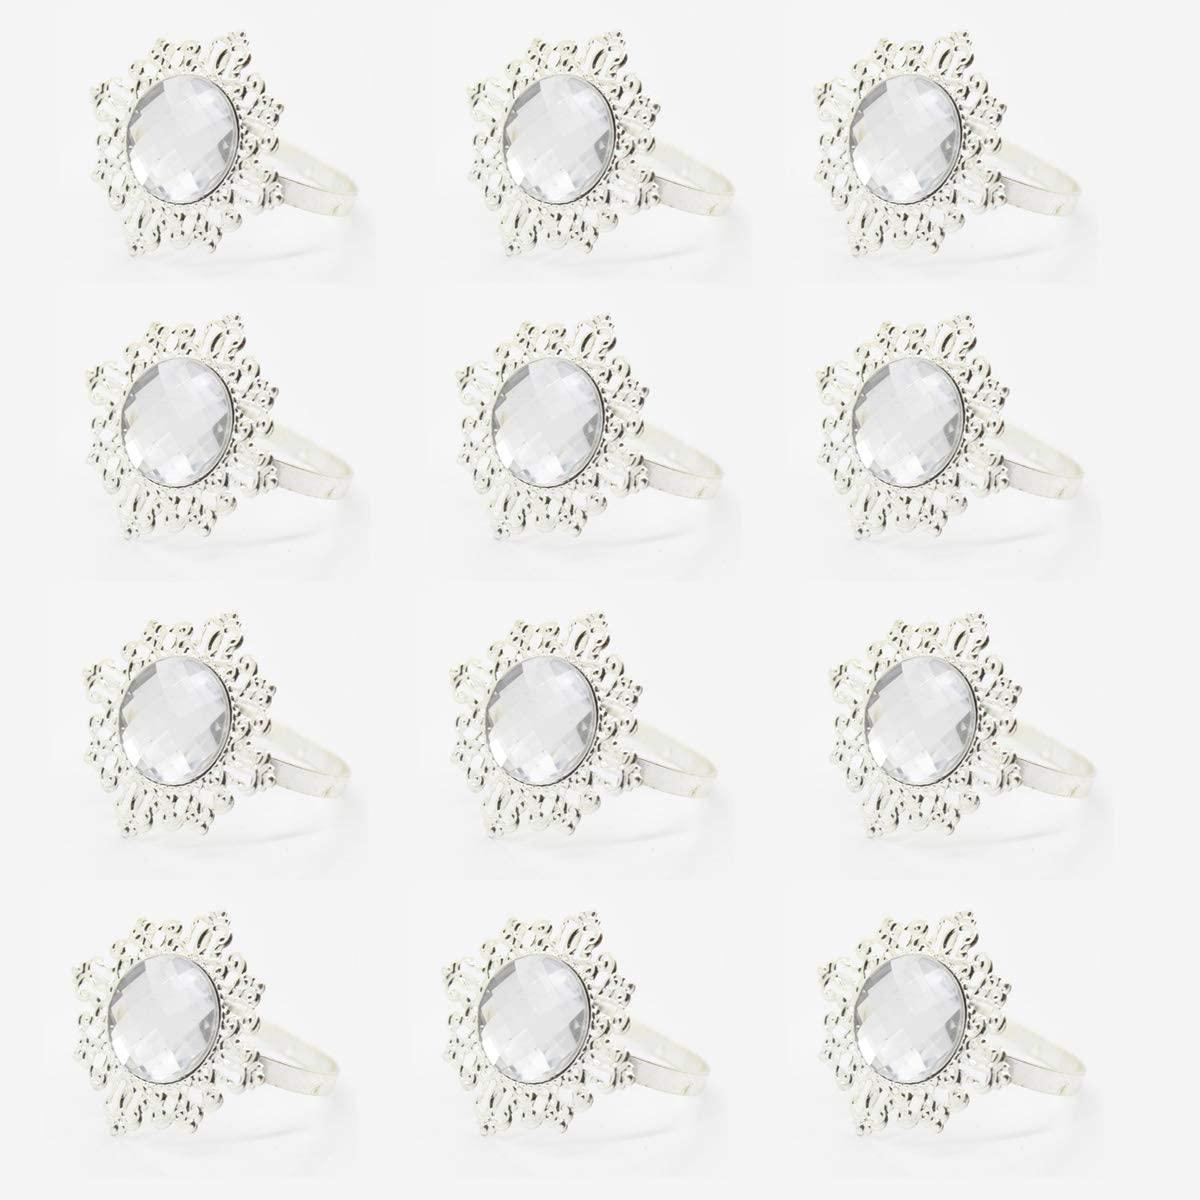 Beauy Girl 12 Pack Silver Bling Napkin Rings Napkin Holder for Wedding Banquet Parties Dinner